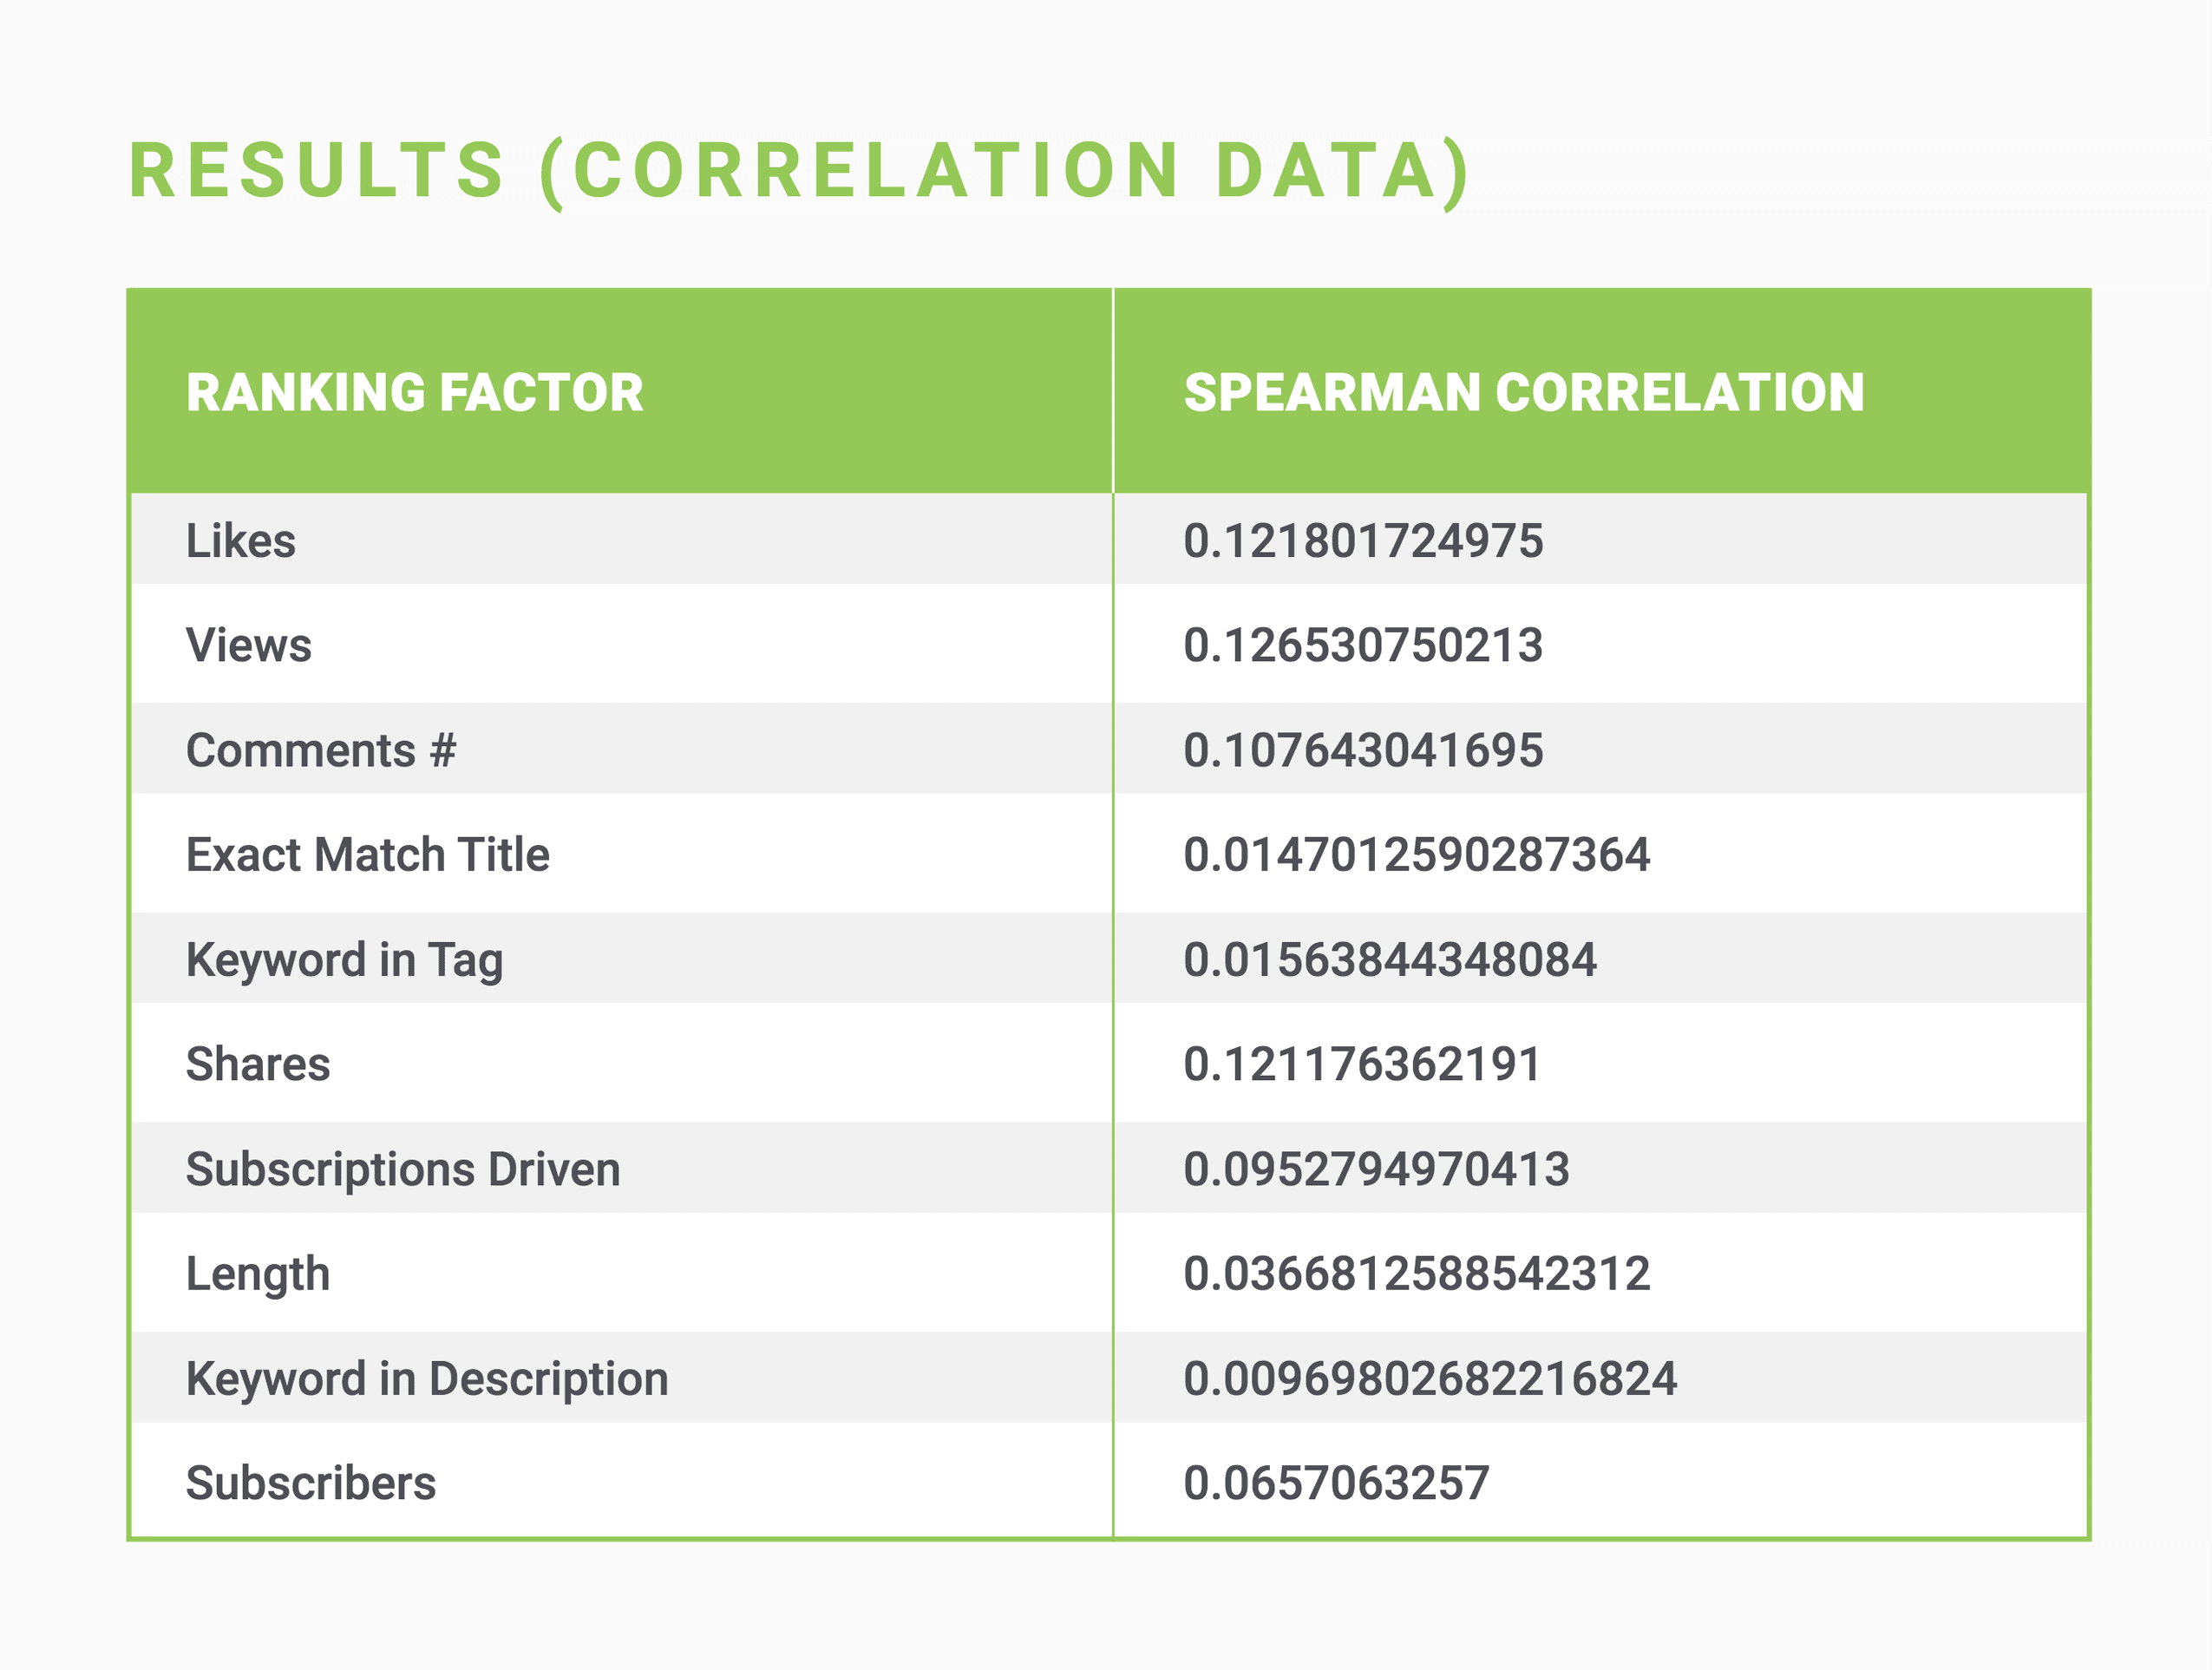 Correlation data